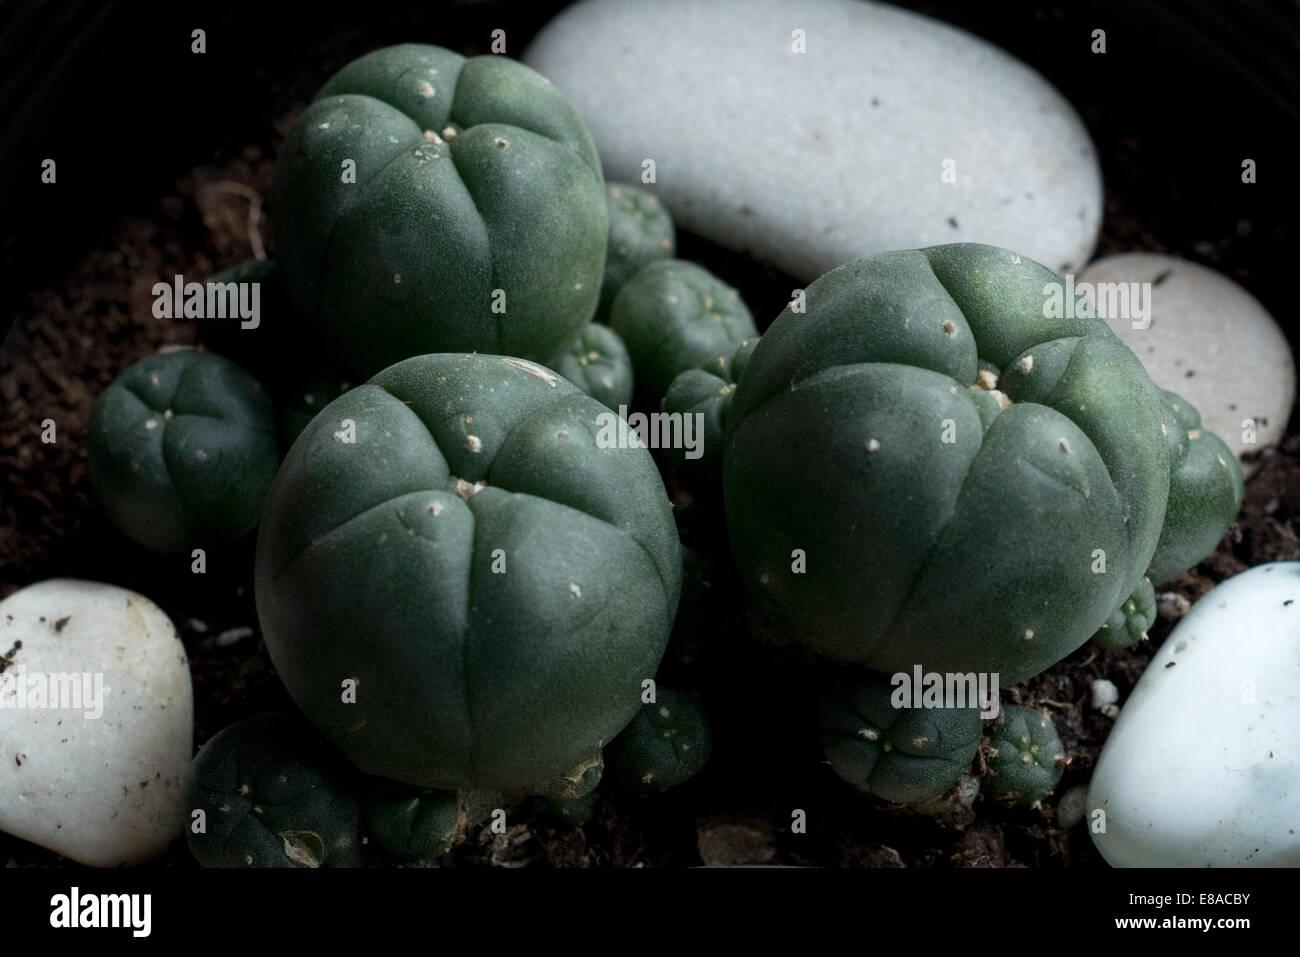 Peyote Cactus Lophophora Williamsii  Lophophora williamsii or peyote